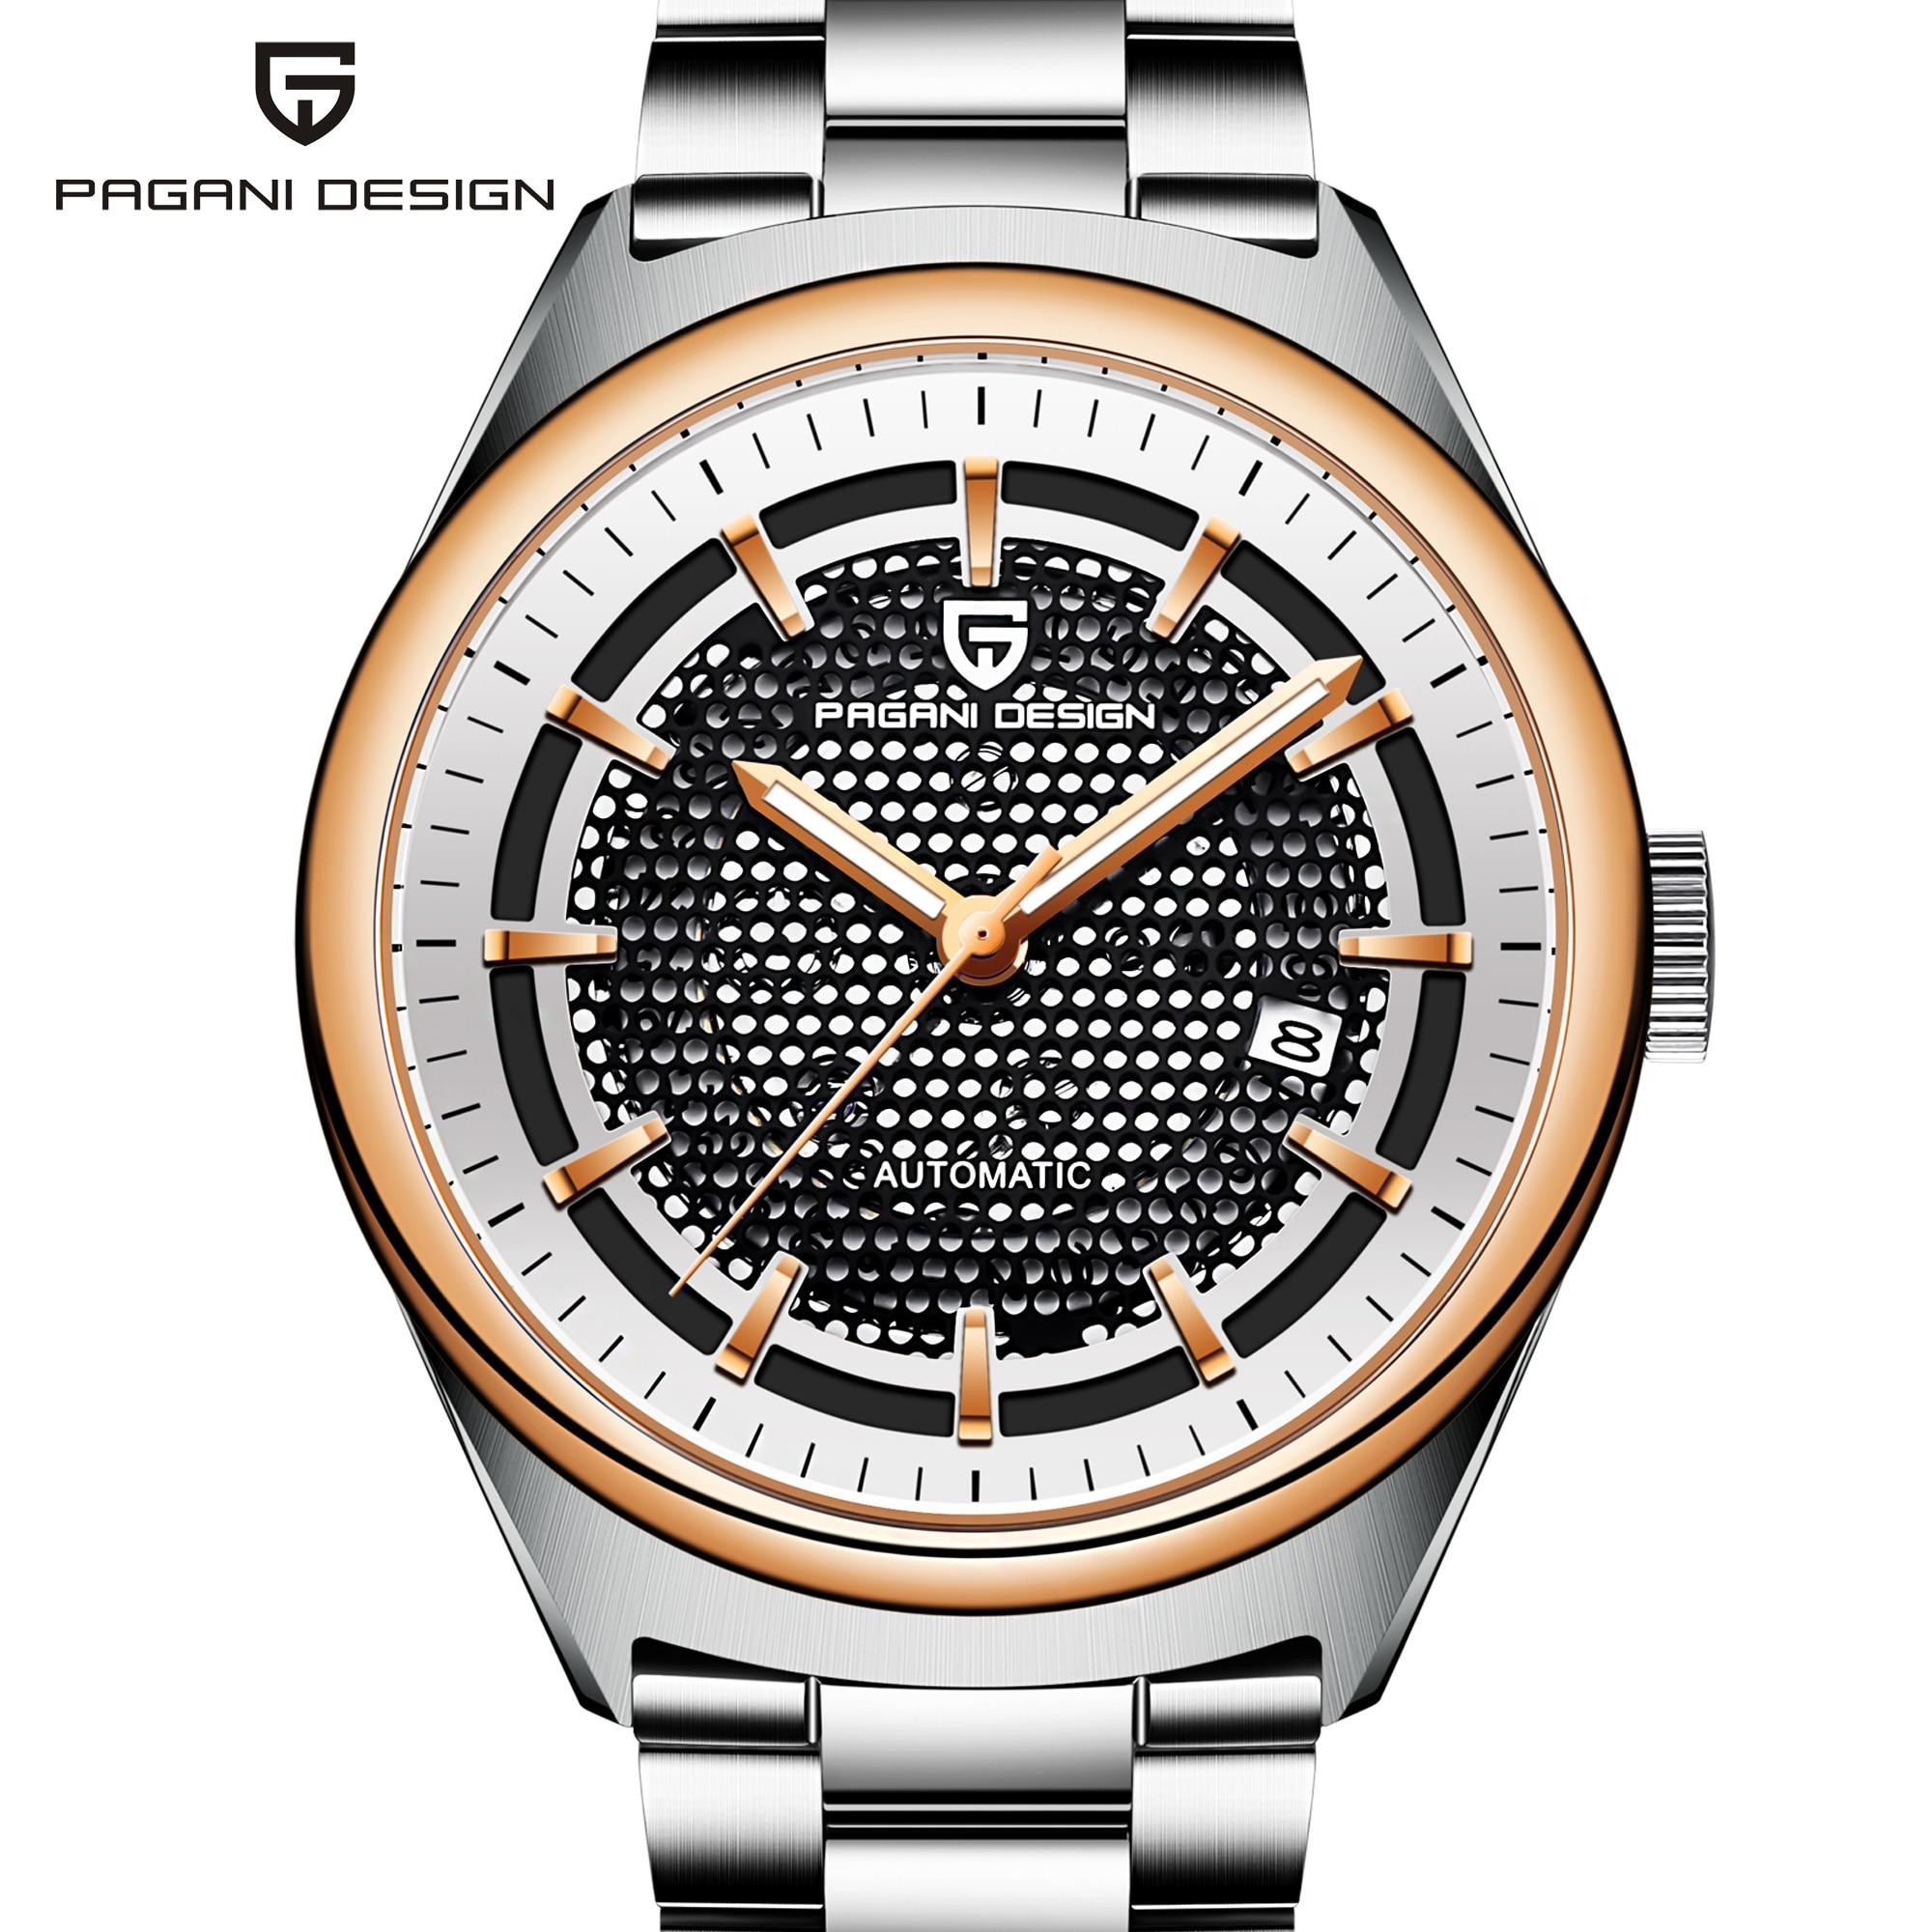 PAGANI DESIGN Automatic Seagull 2813 Movement Mens Mechanical Watch Stainless Steel Business Waterproof Clock Relogio Masculino